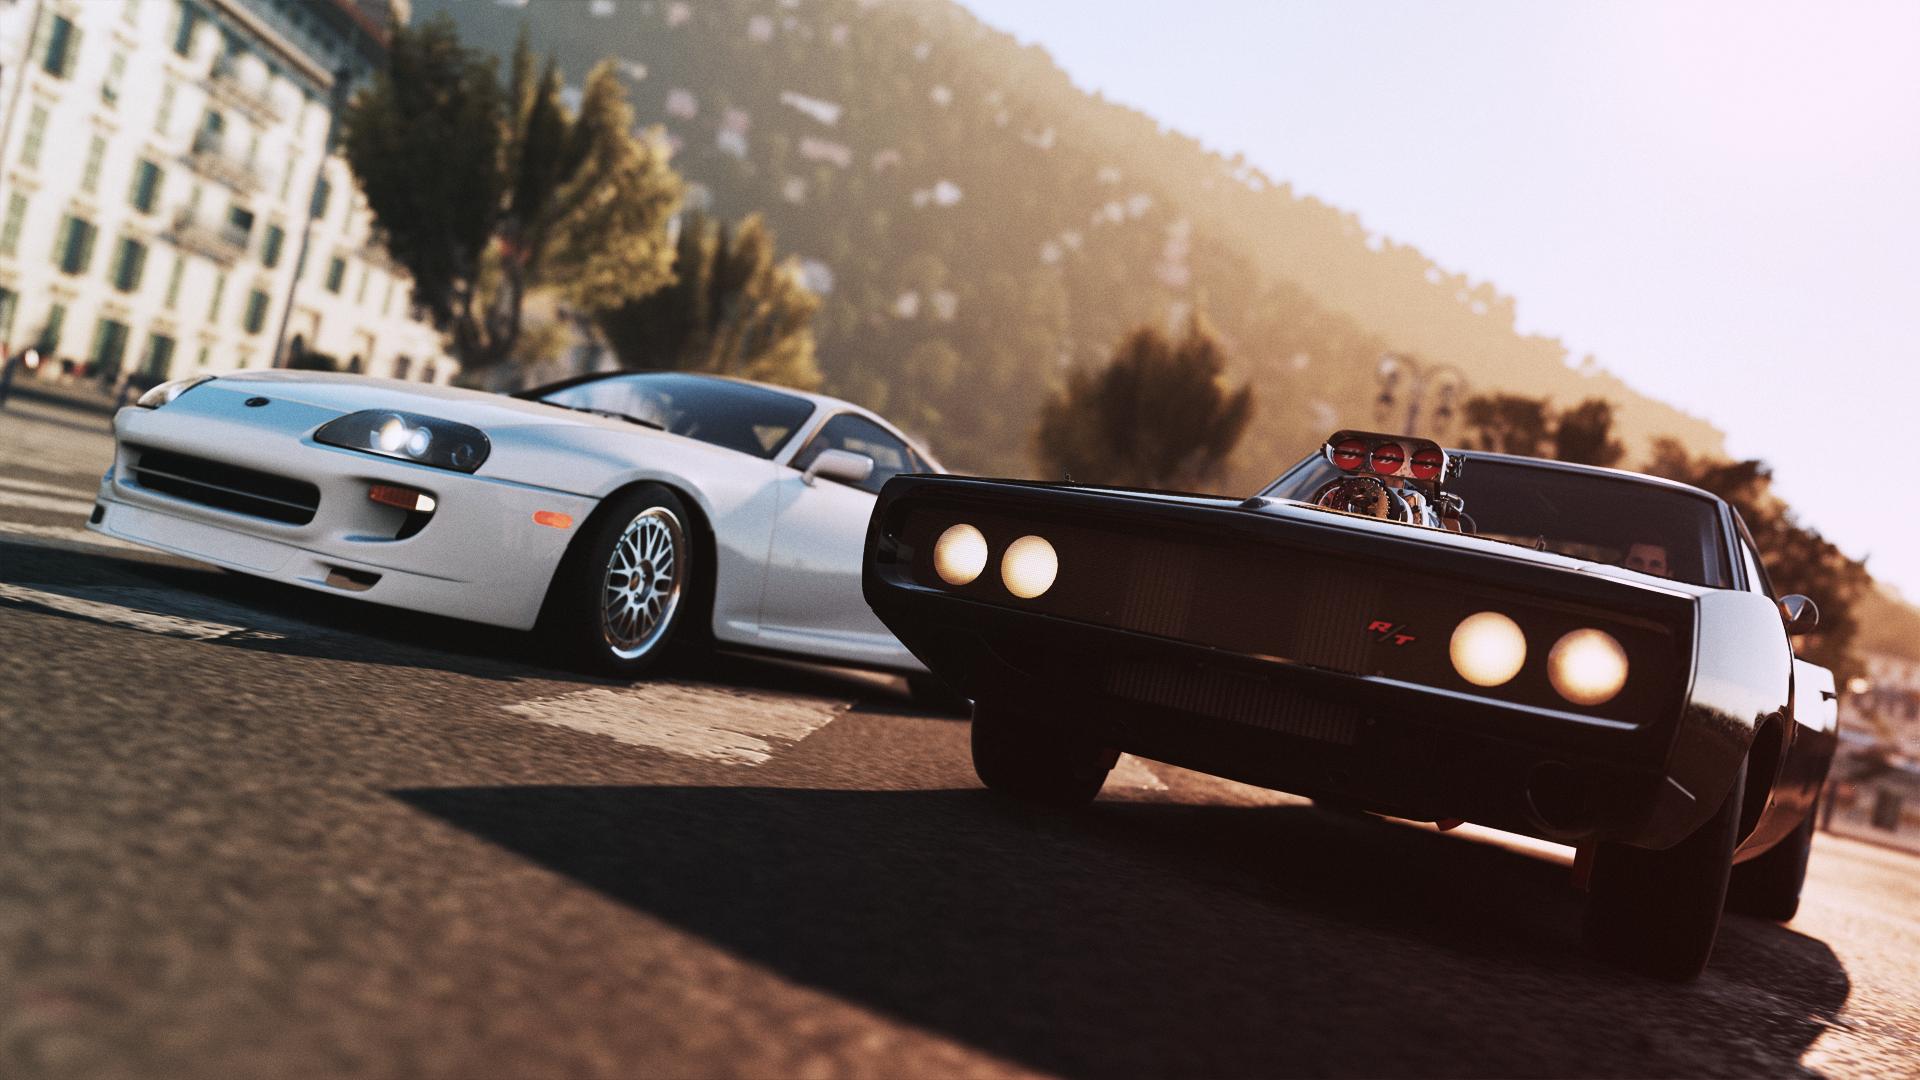 Xbox Forza Horizon 2 Presents Fast Furious Achievements Find Your On XboxDVR